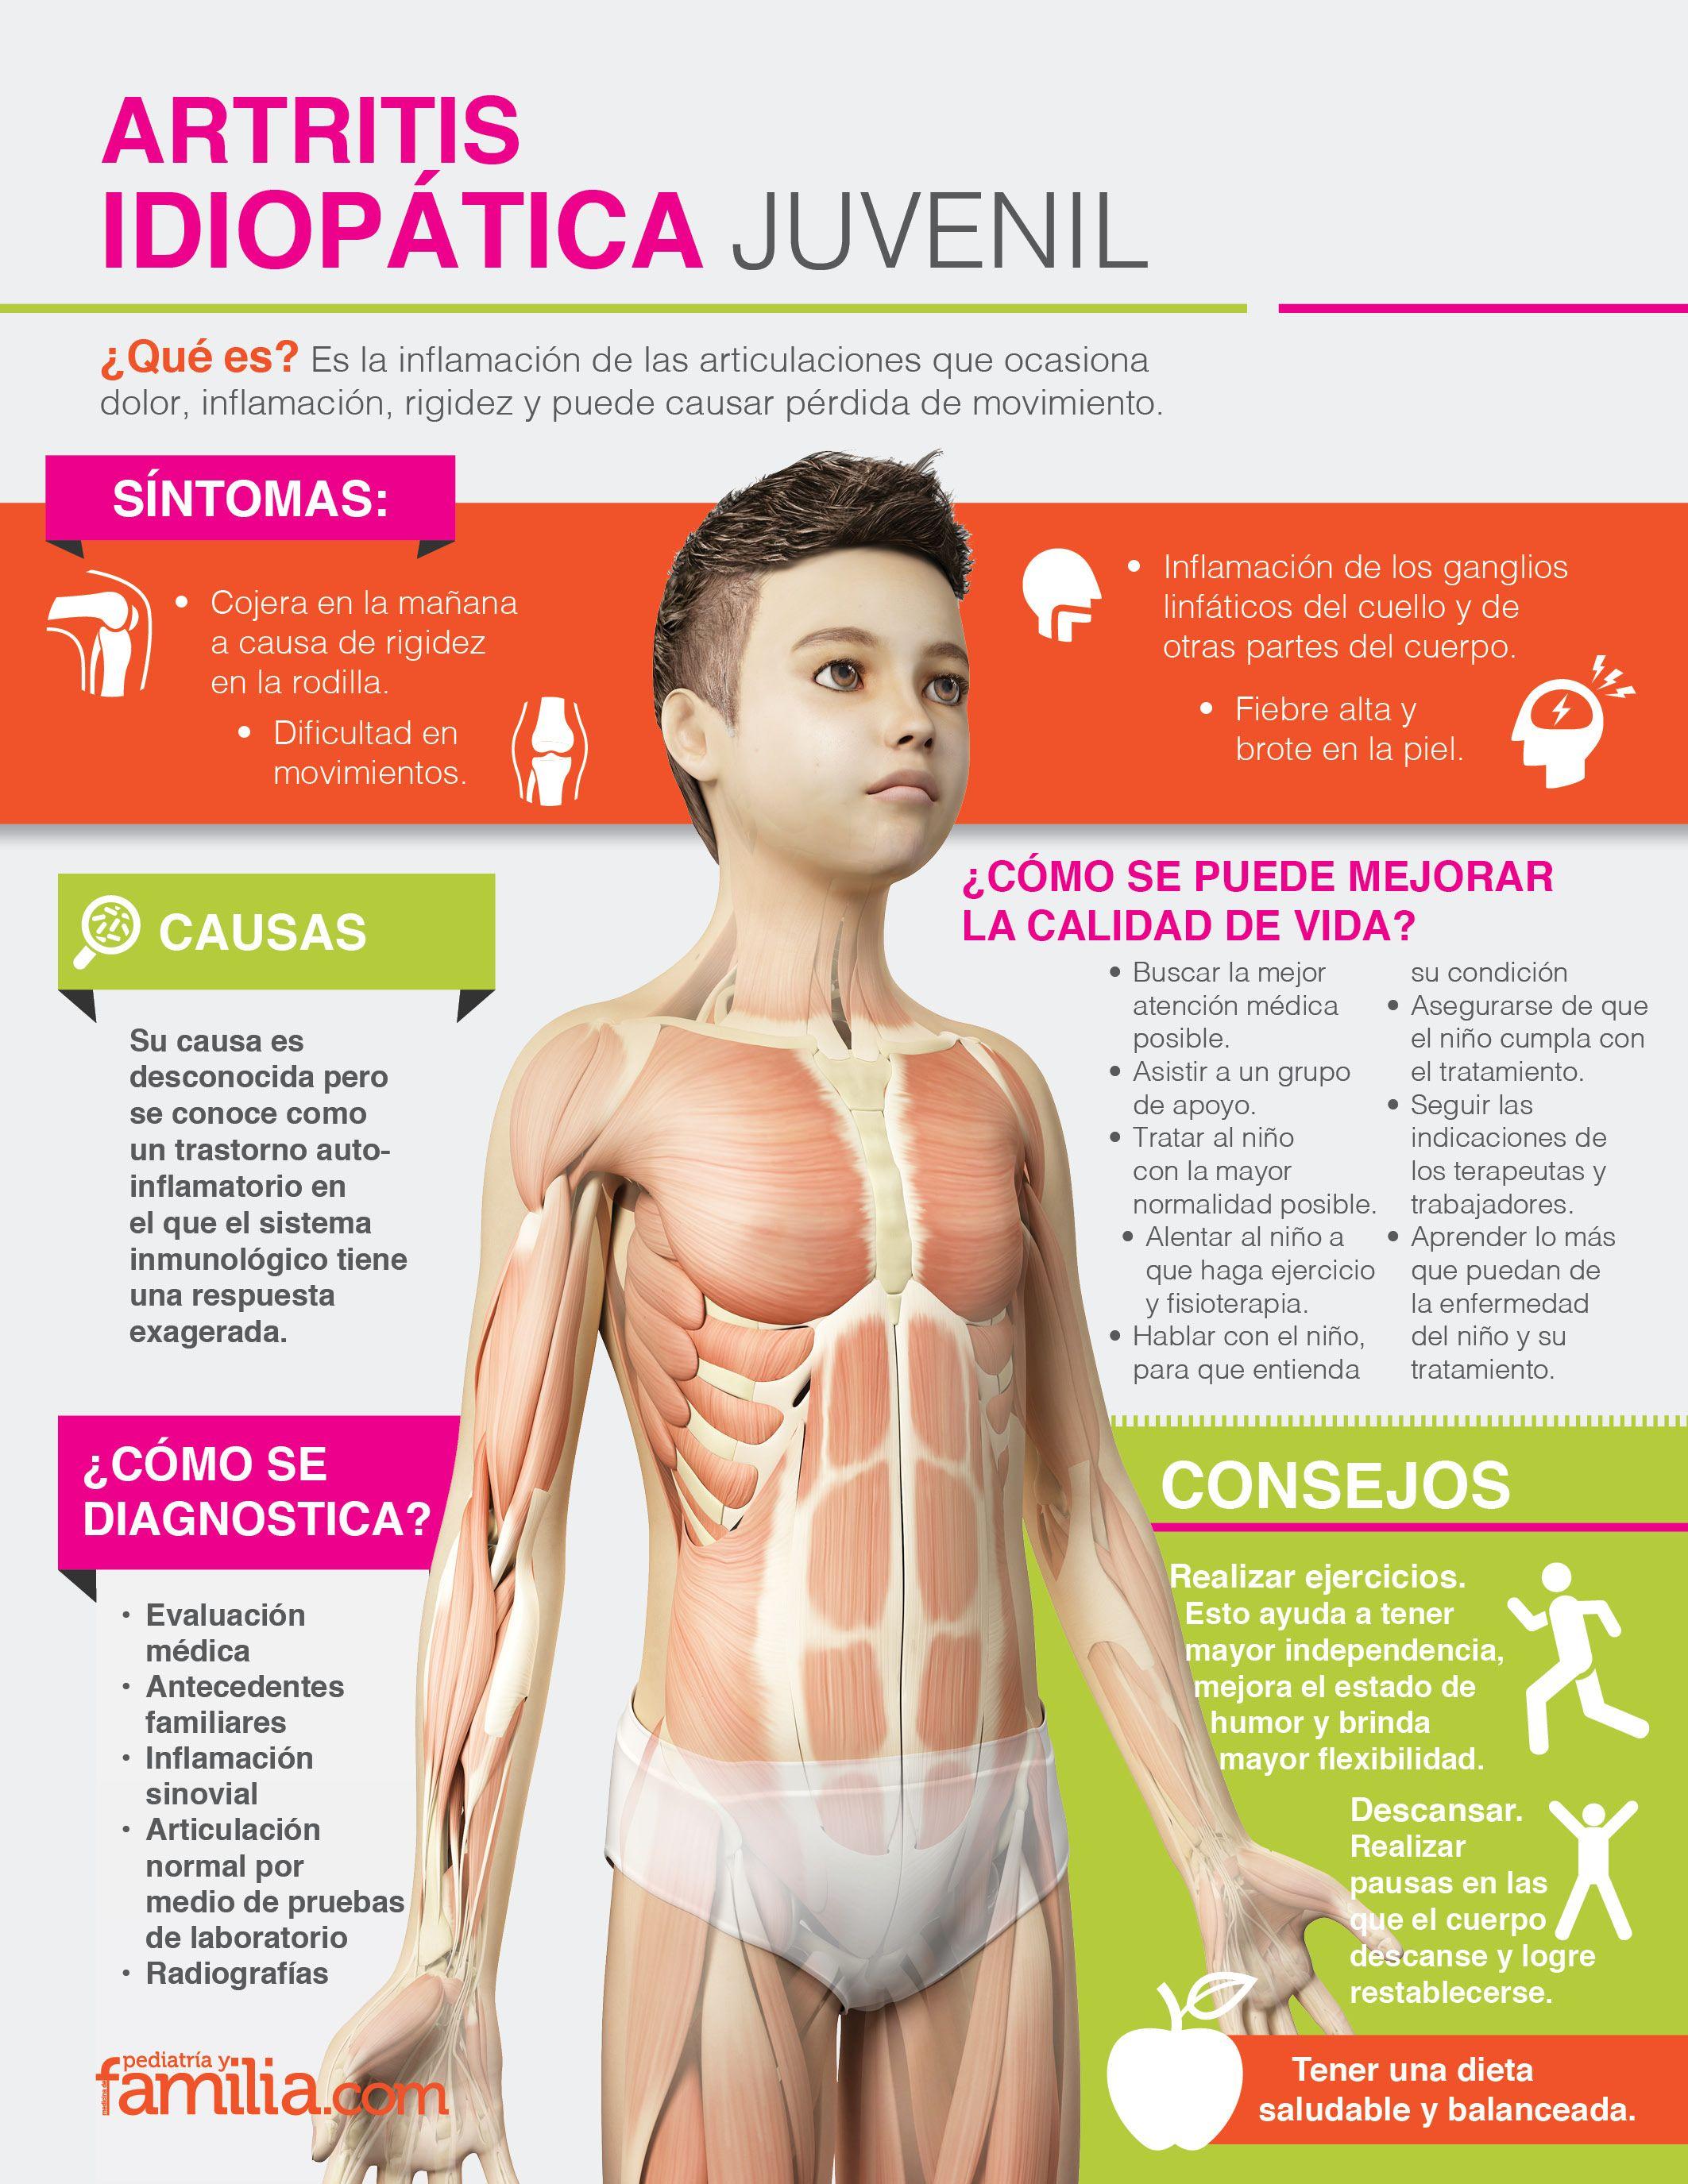 artritis idiopática juvenil sistémica diabetes emedicina